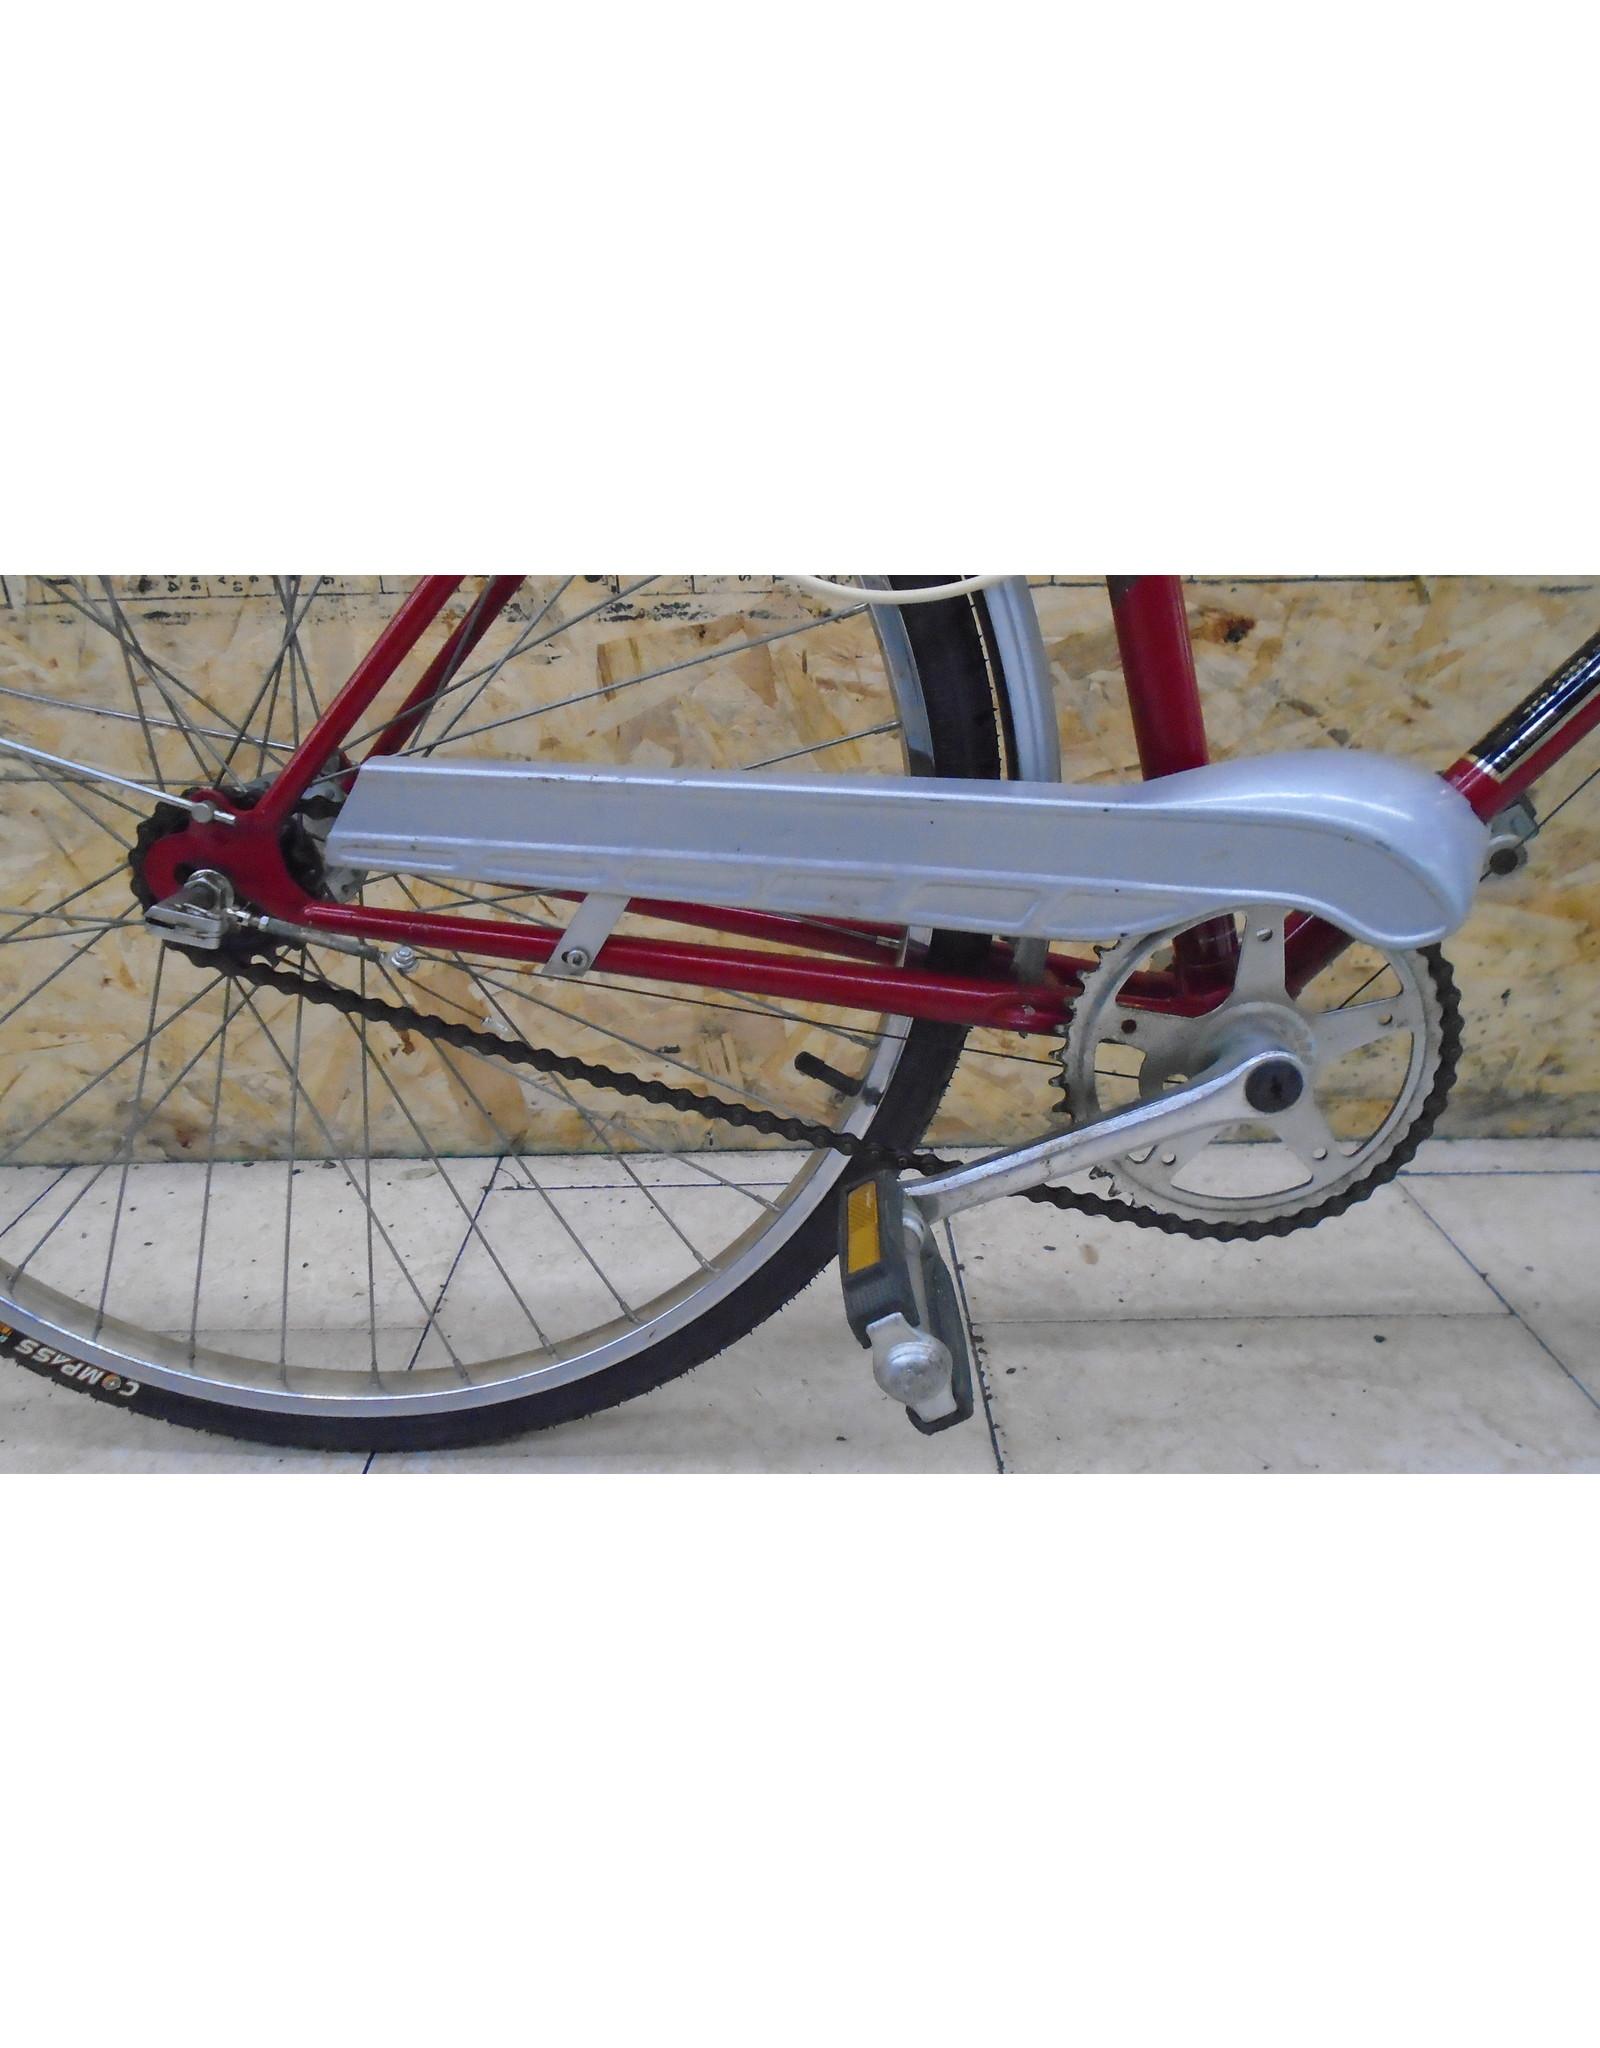 "Vélo usagé de ville Vélosport 19"" - 11045"